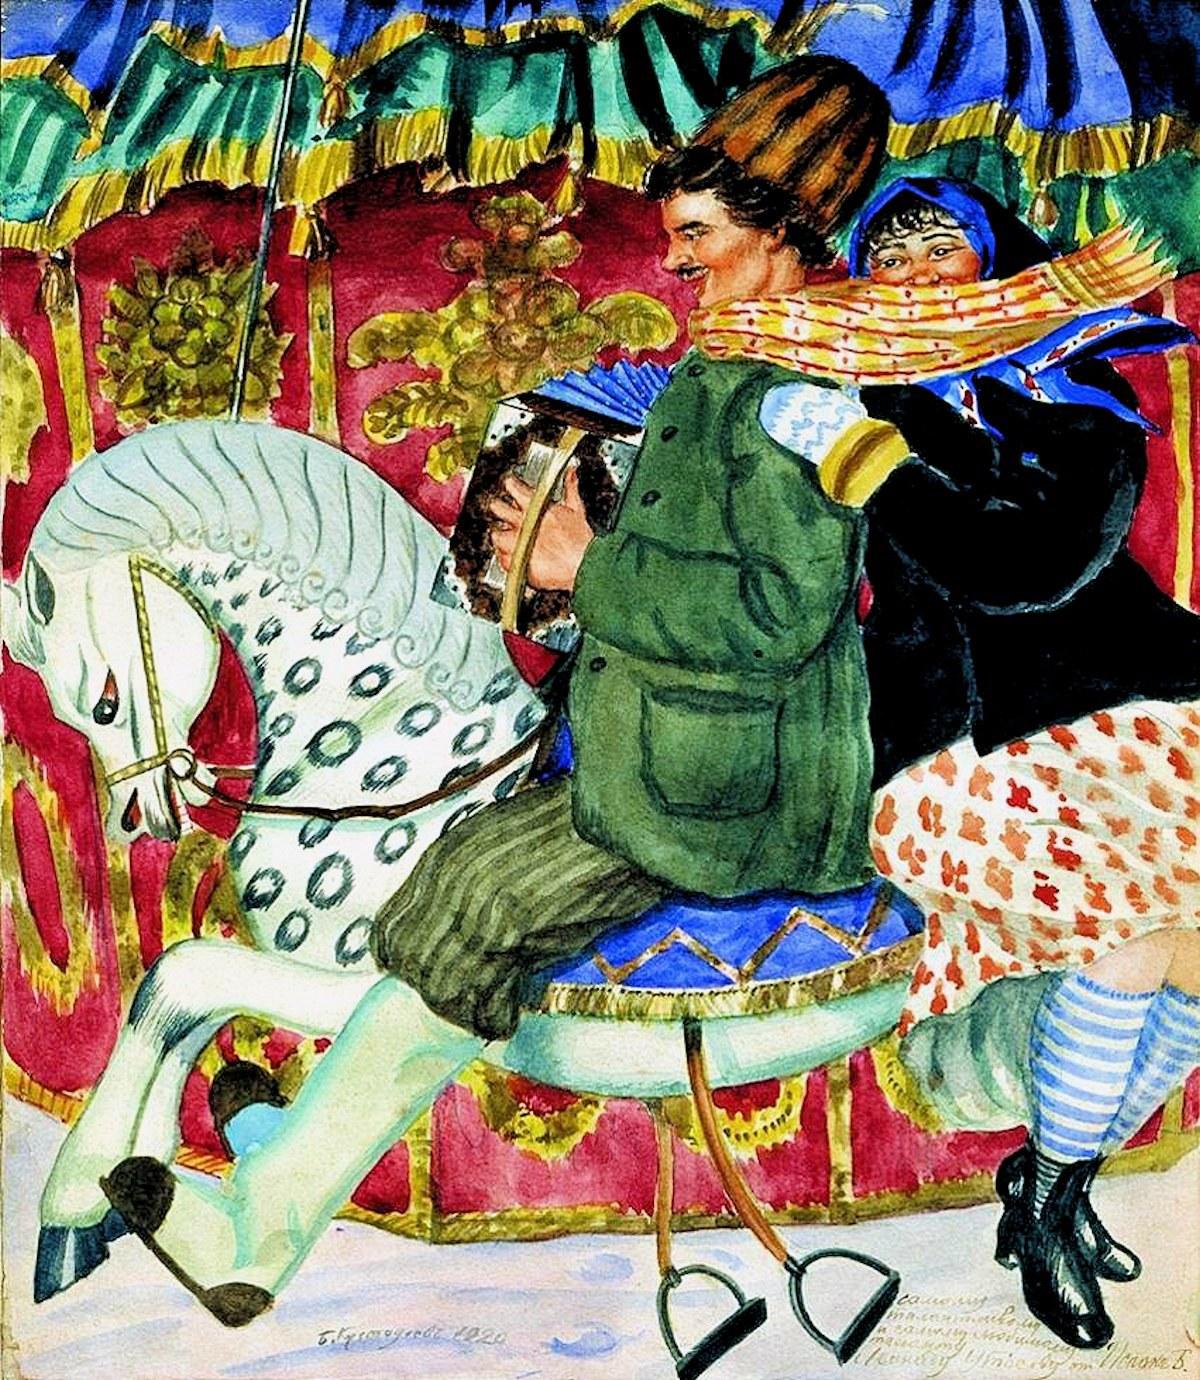 Boris Kustodiev. A Carousel. 1920